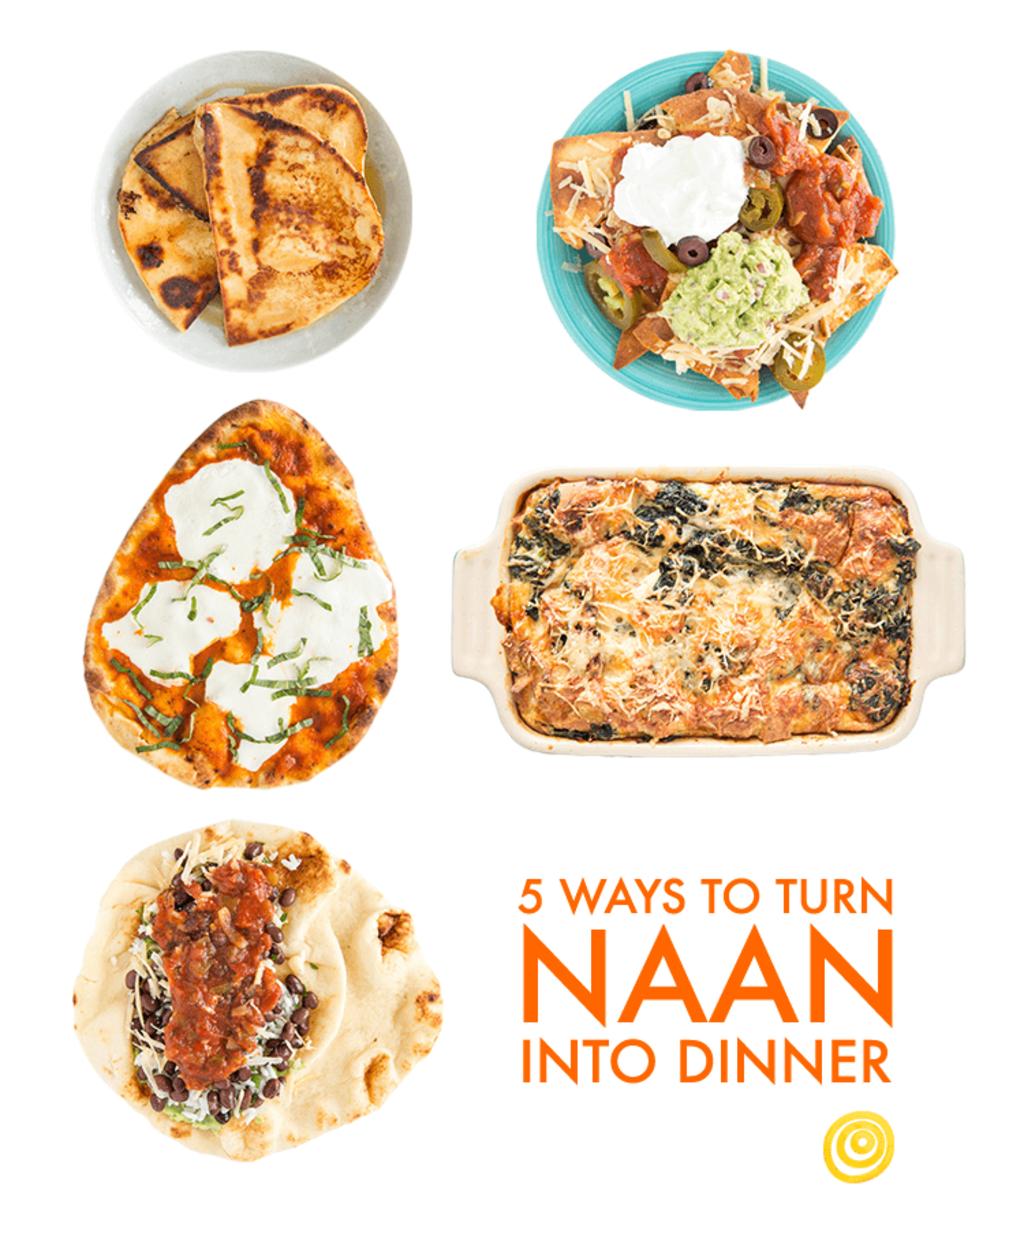 5 Fun Ways to Turn Naan into Dinner   Kitchn